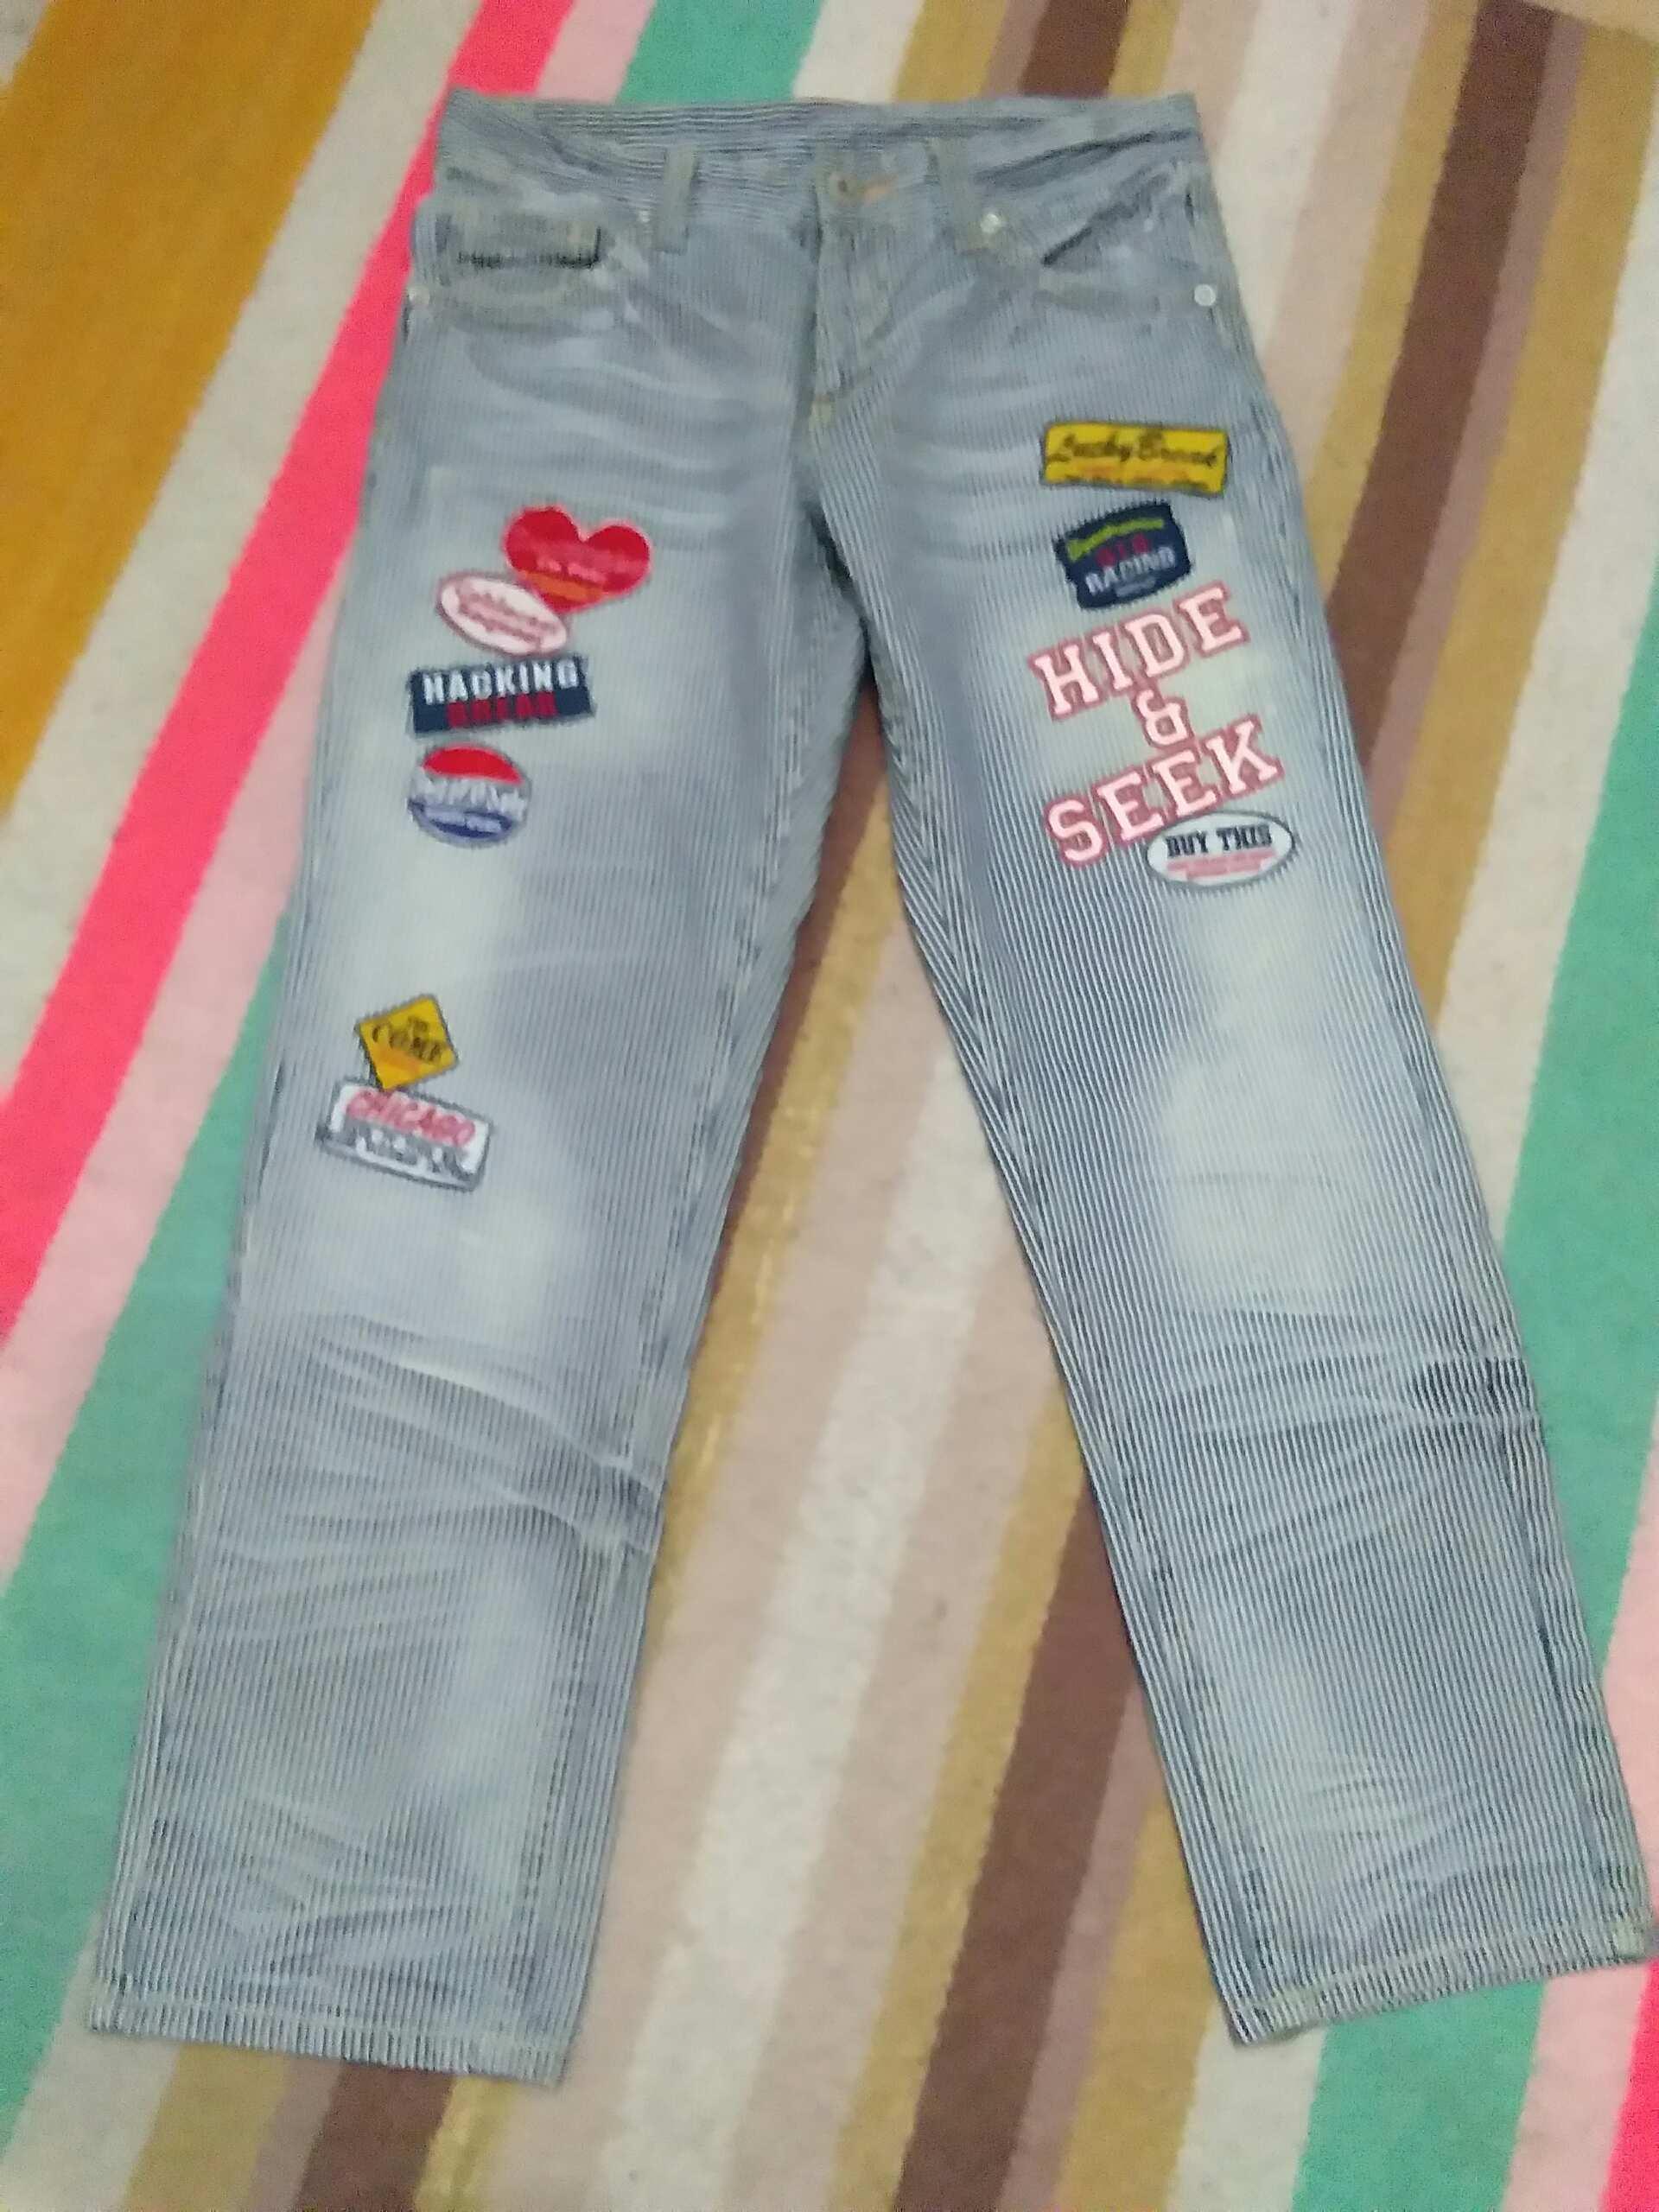 Japanese Brand Love Denim Hickory Striped Patches Hide Seek Denim Jeans